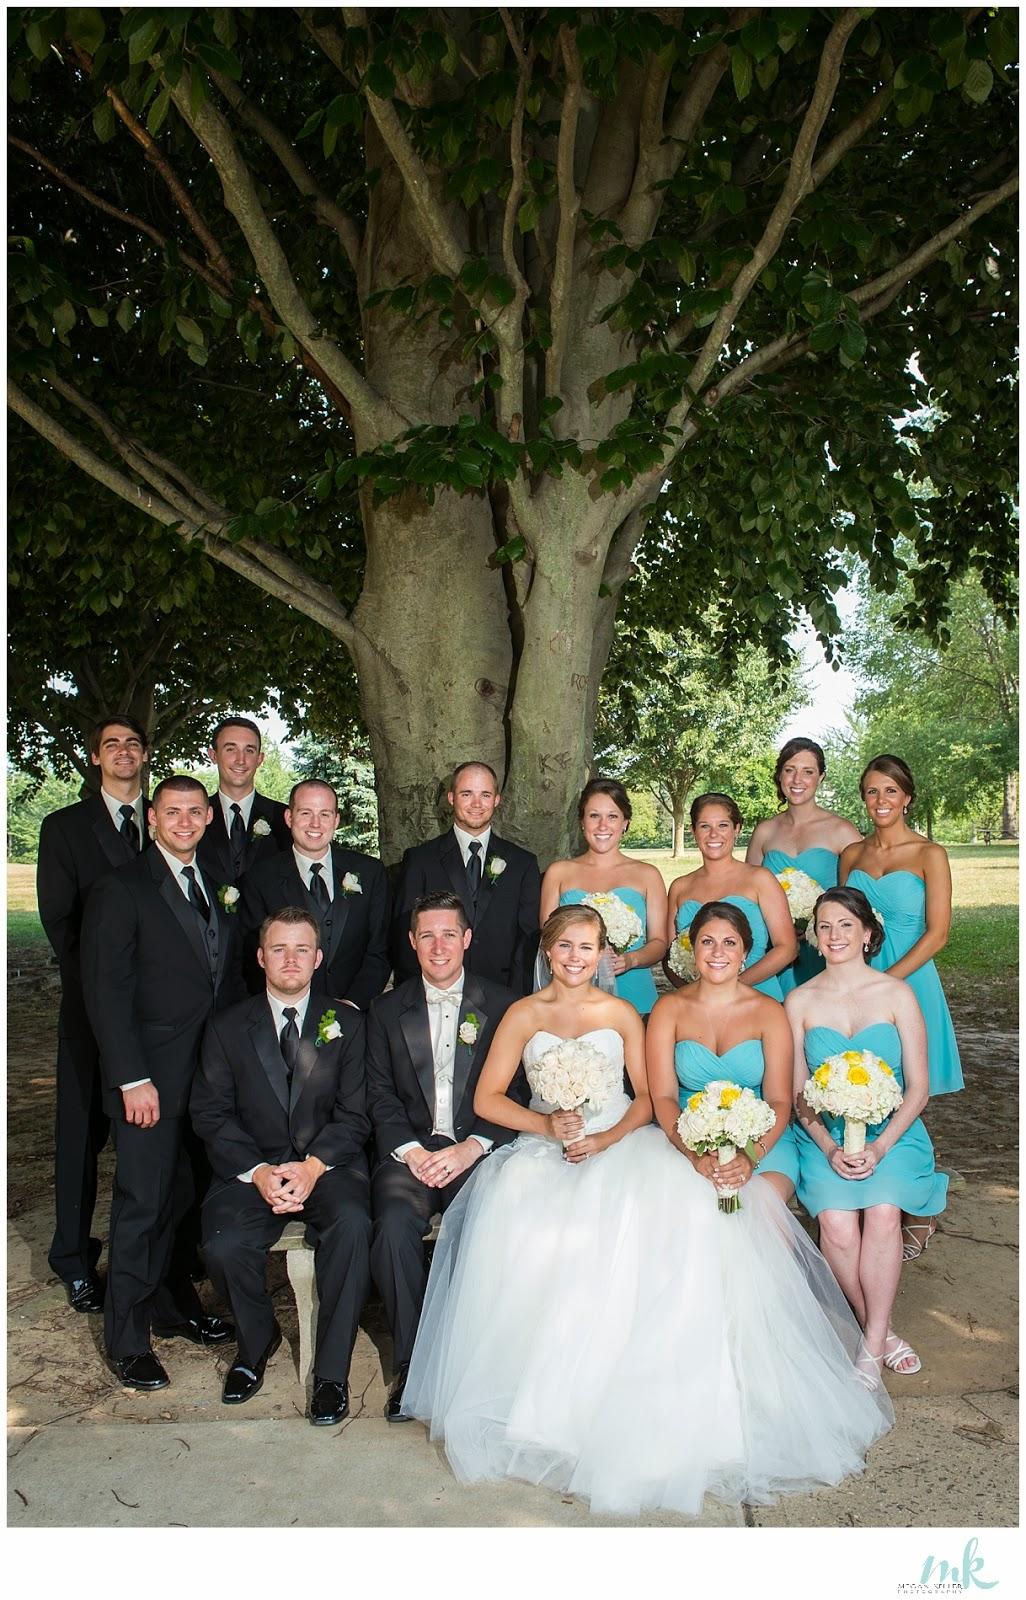 Danielle and Dan's wedding Danielle and Dan's wedding 2014 07 16 0012